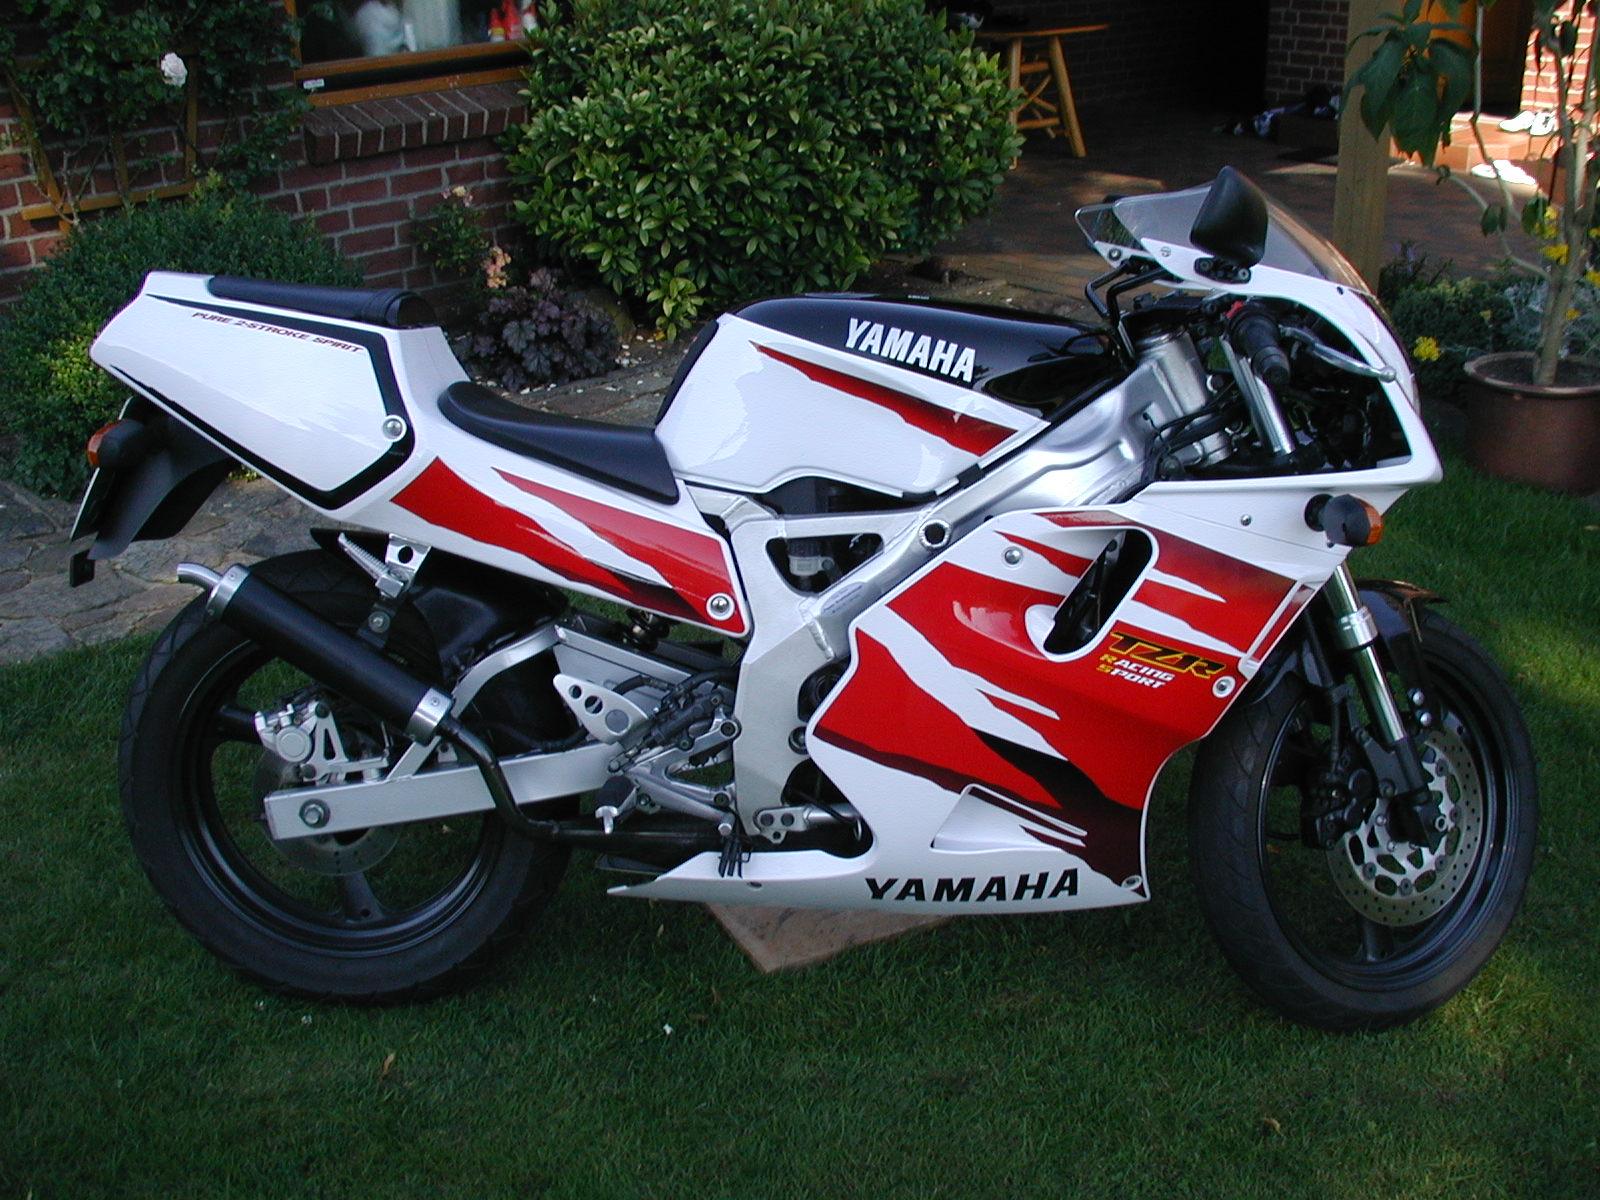 Yamaha R Models